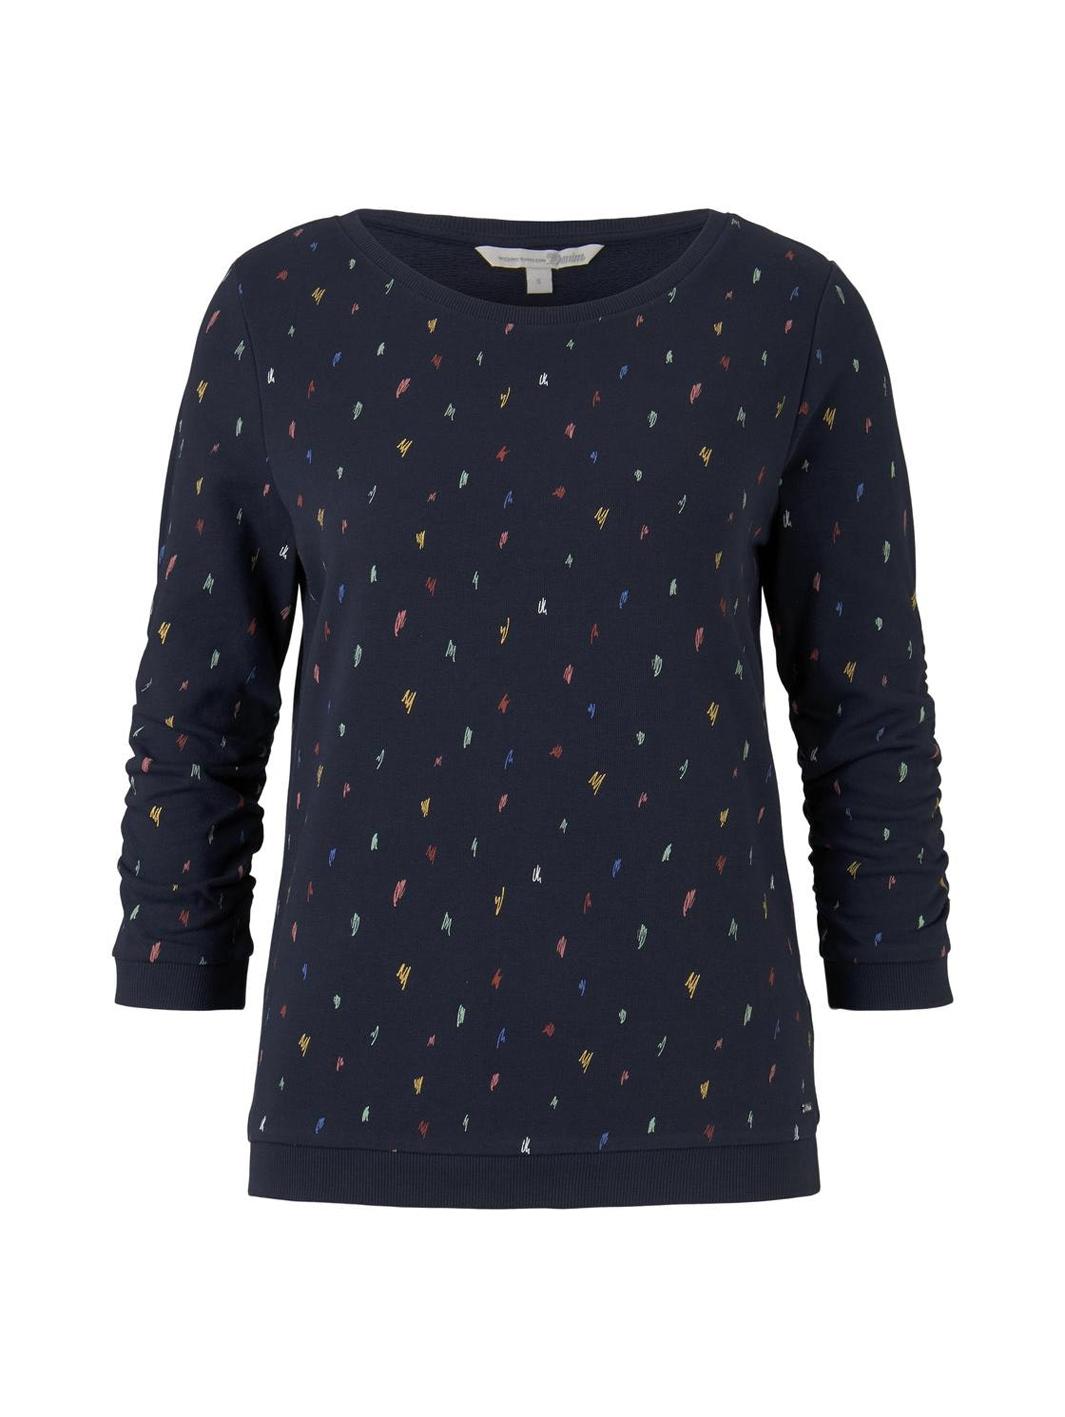 Tom Tailor gemustertes Sweatshirt